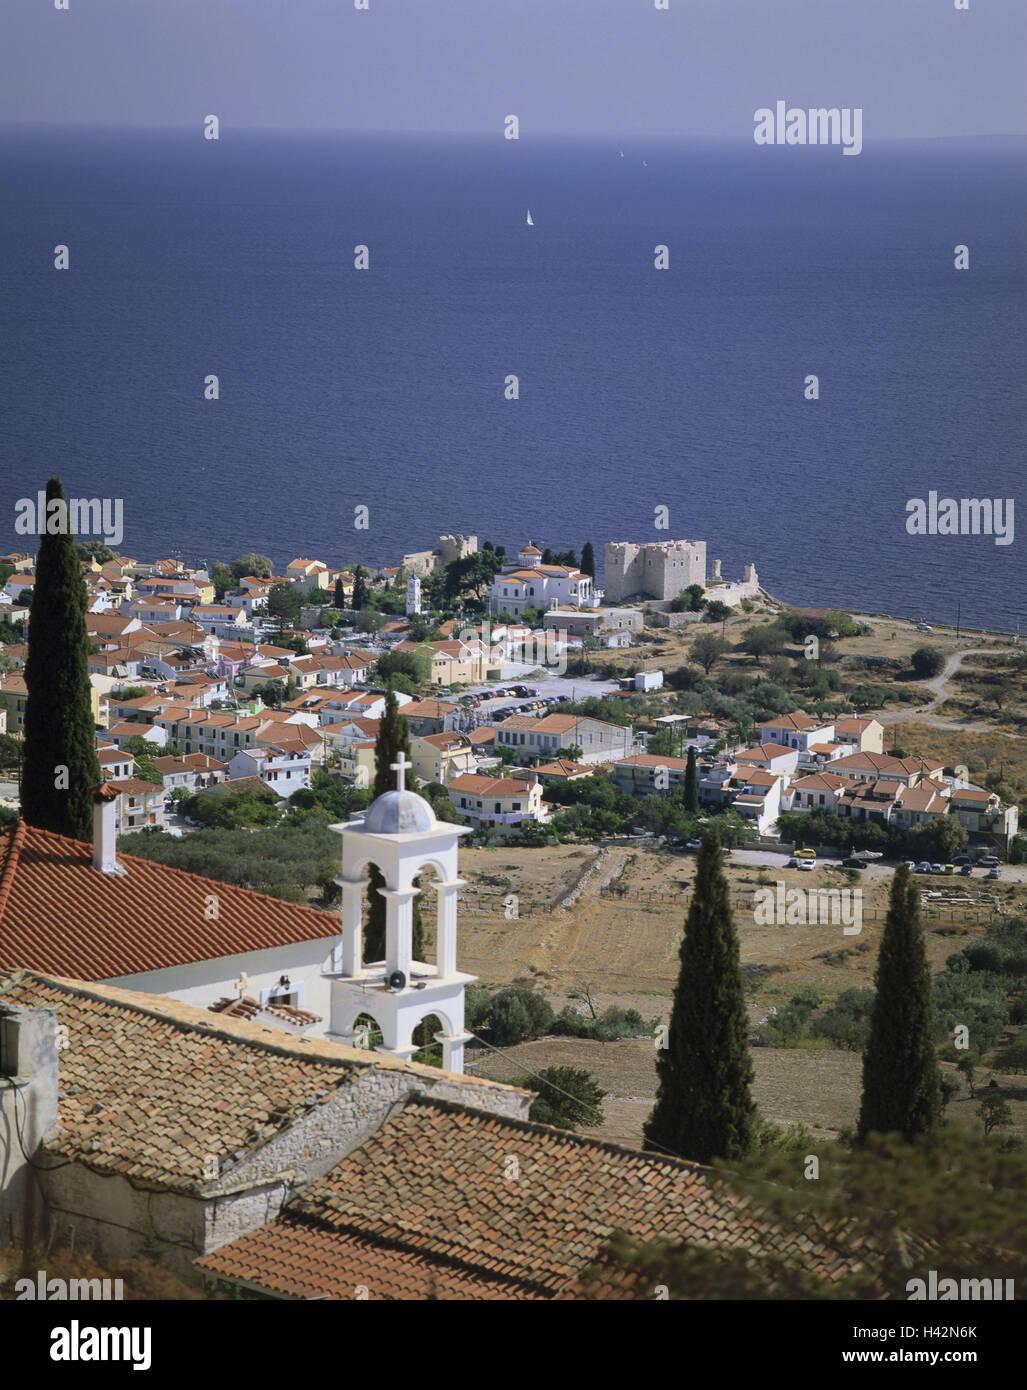 Greece, island Samos, Pythagorion, local overview, cloister Panagia, coastal region, coast, village, place, houses, Stock Photo